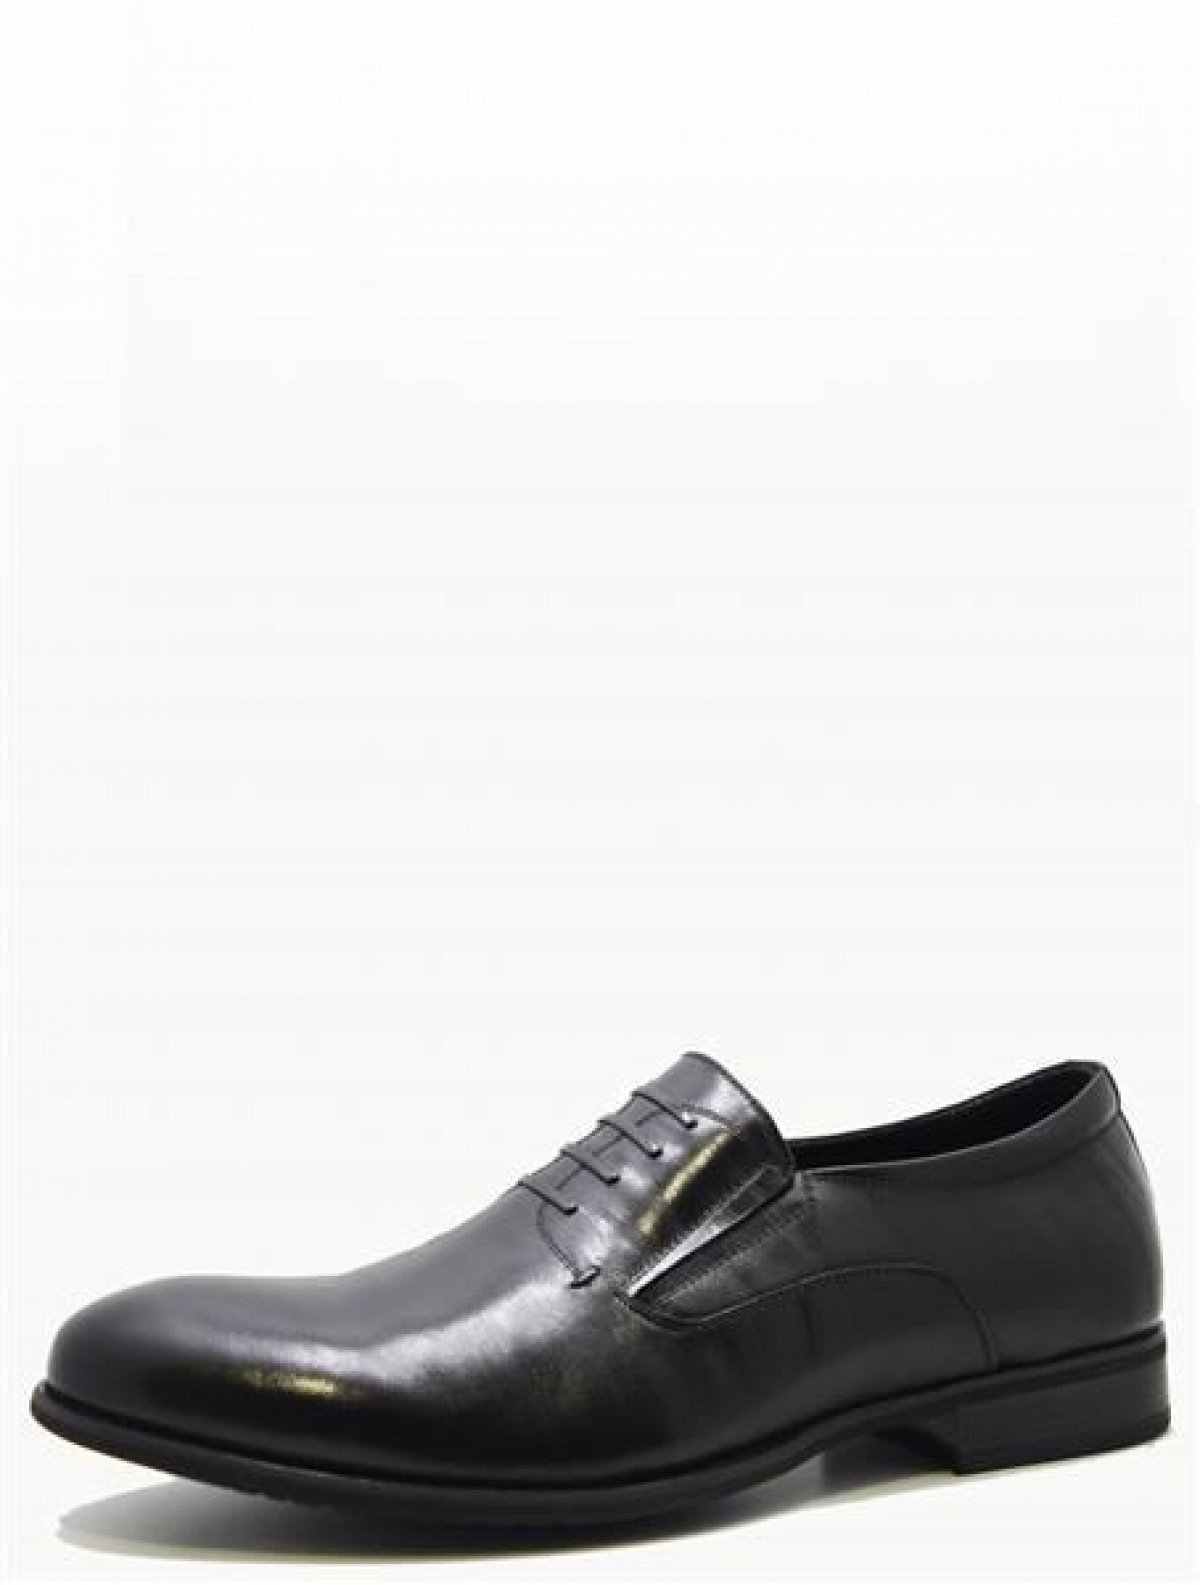 Baden R005-050 мужские туфли